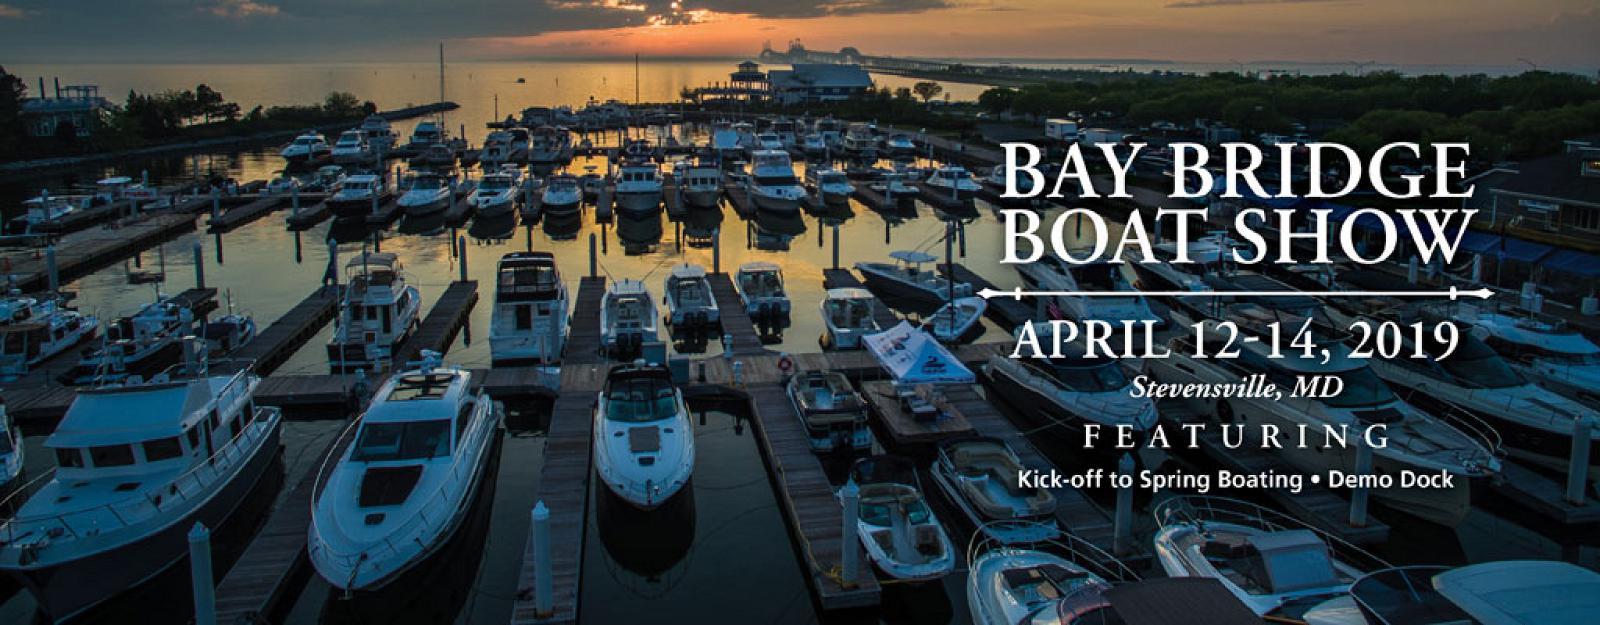 photo of The Bay Bridge Boat Show